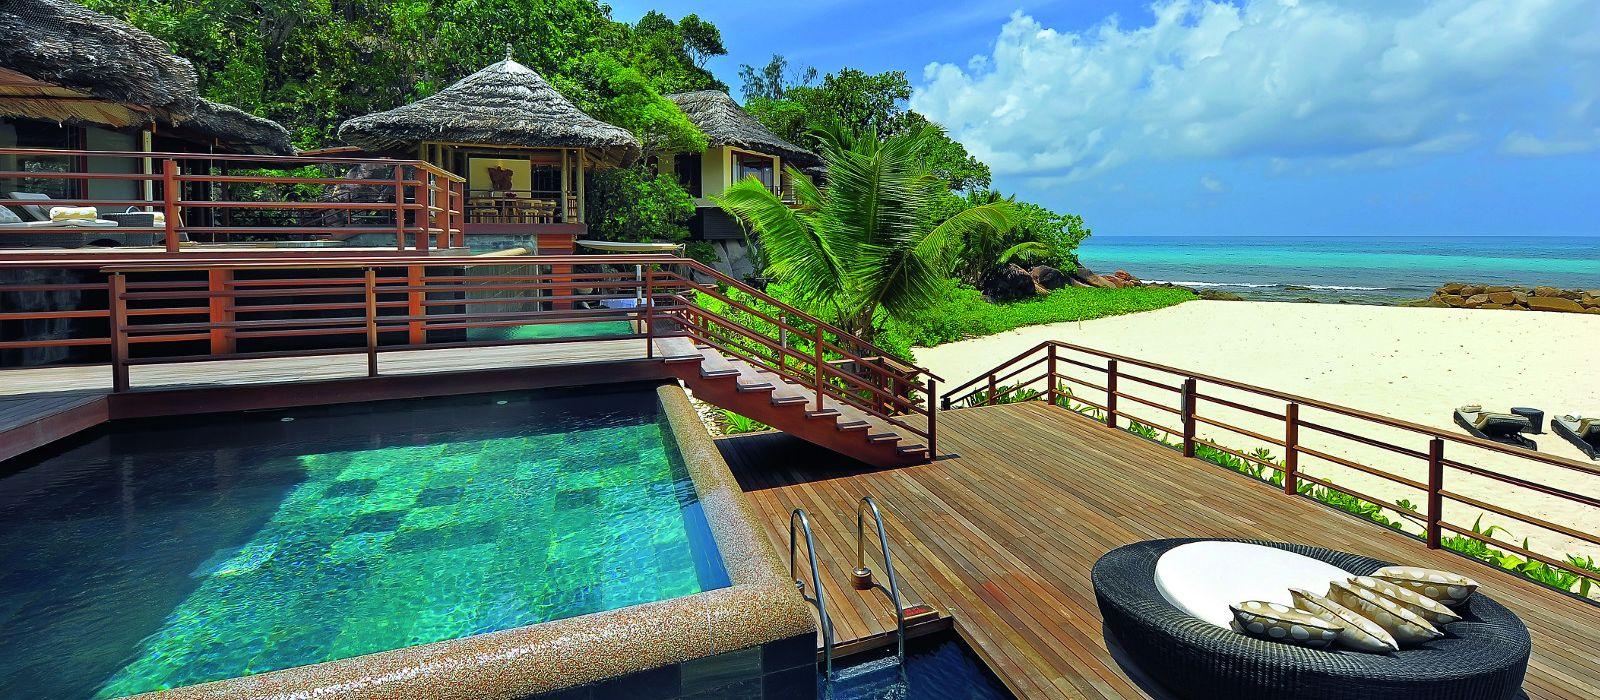 Seychelles Island Paradises Tour Trip 3